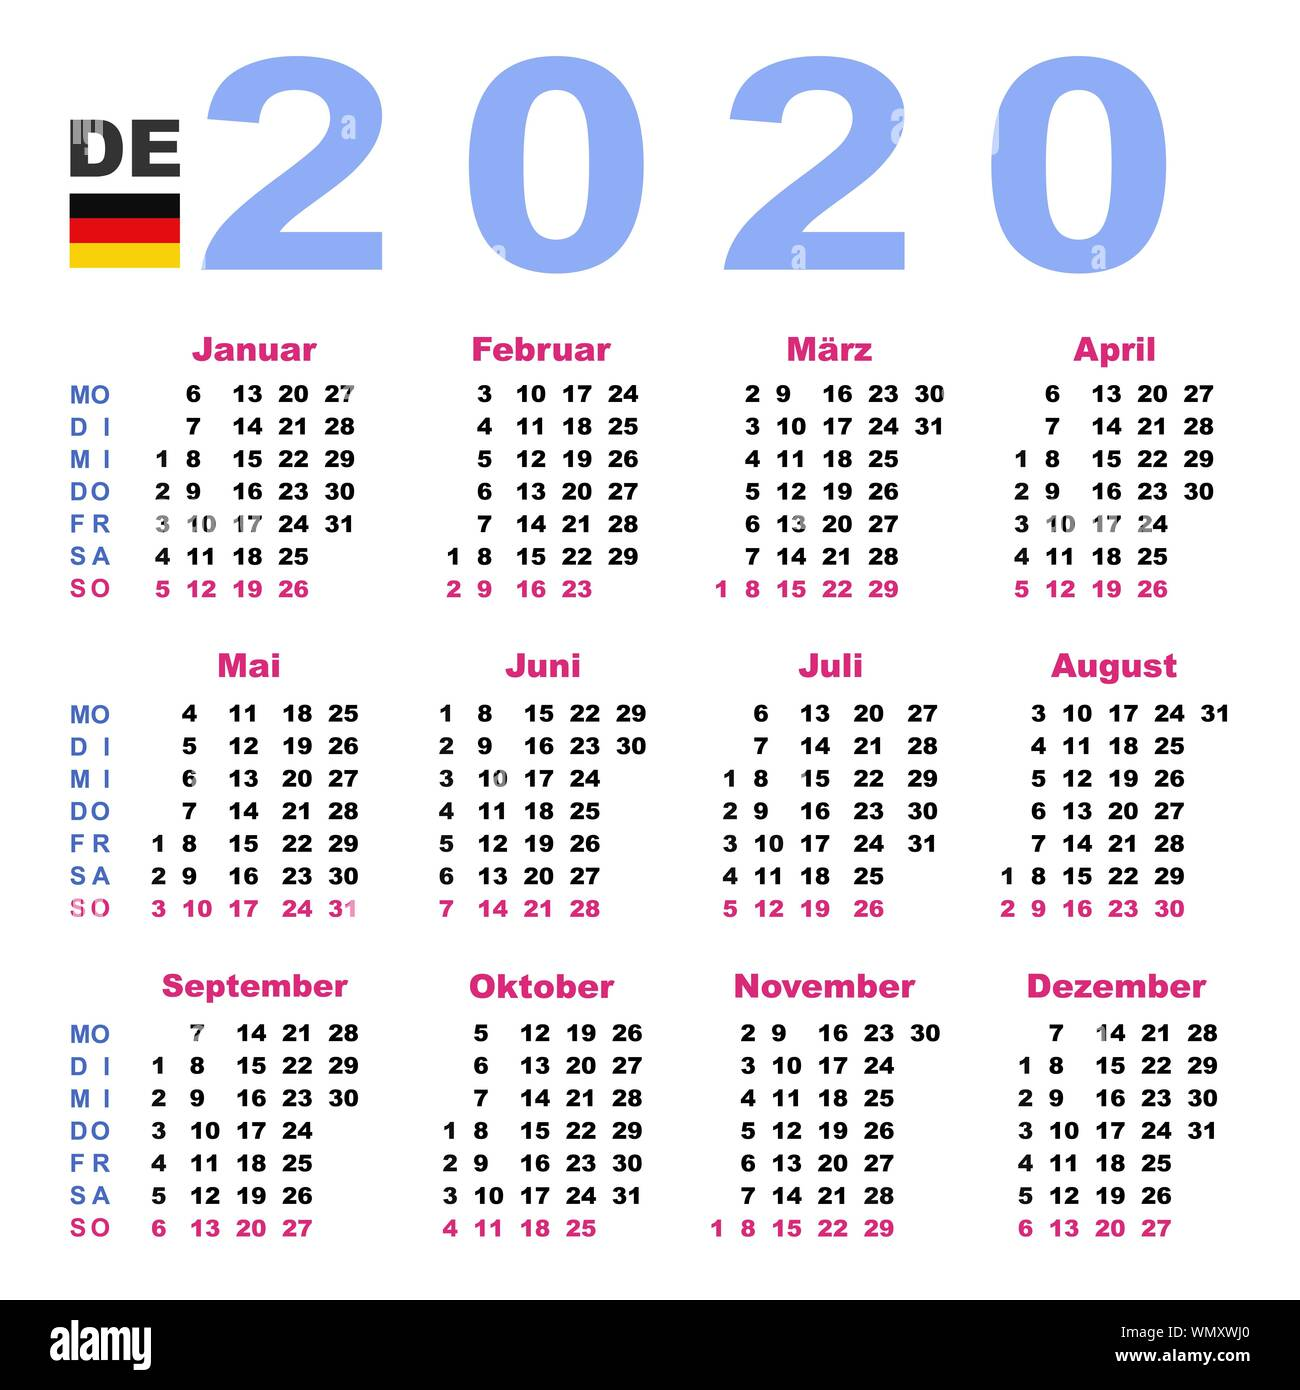 Can Calendrier 2020.Calendar 2020 Stock Photos Calendar 2020 Stock Images Alamy